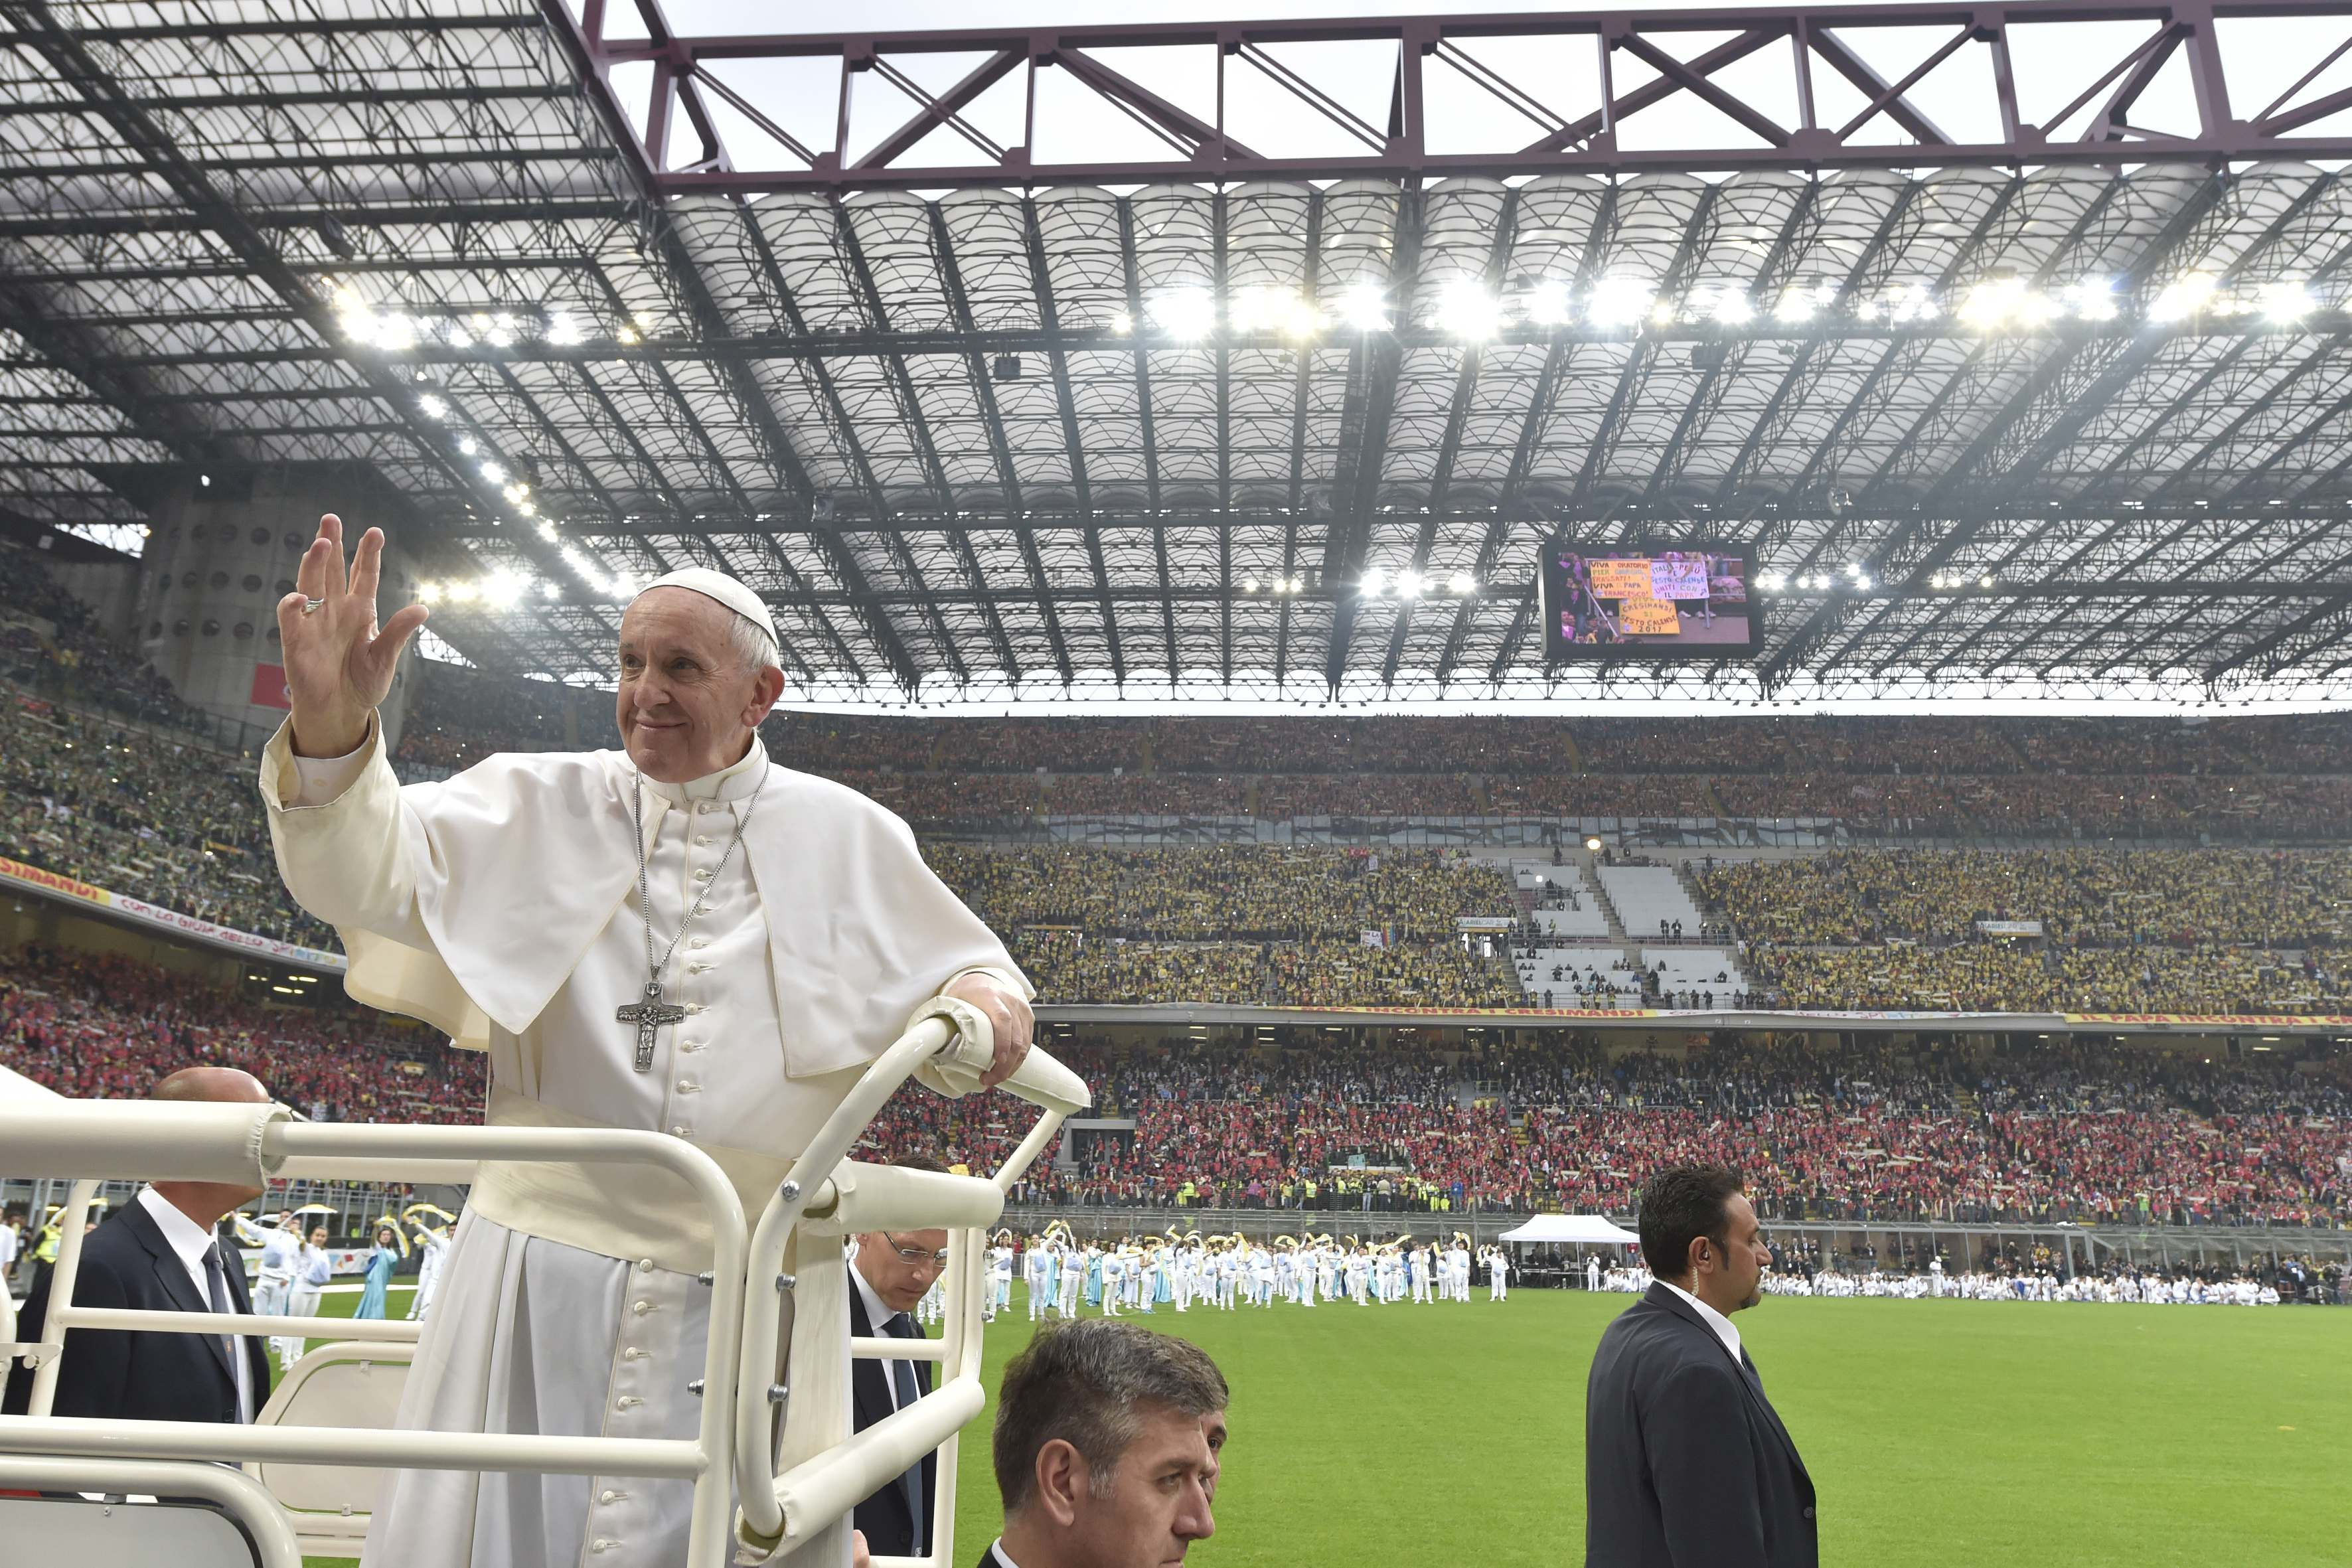 Rencontre avec les jeunes au stade San Siro de Milan © L'Osservatore Romano